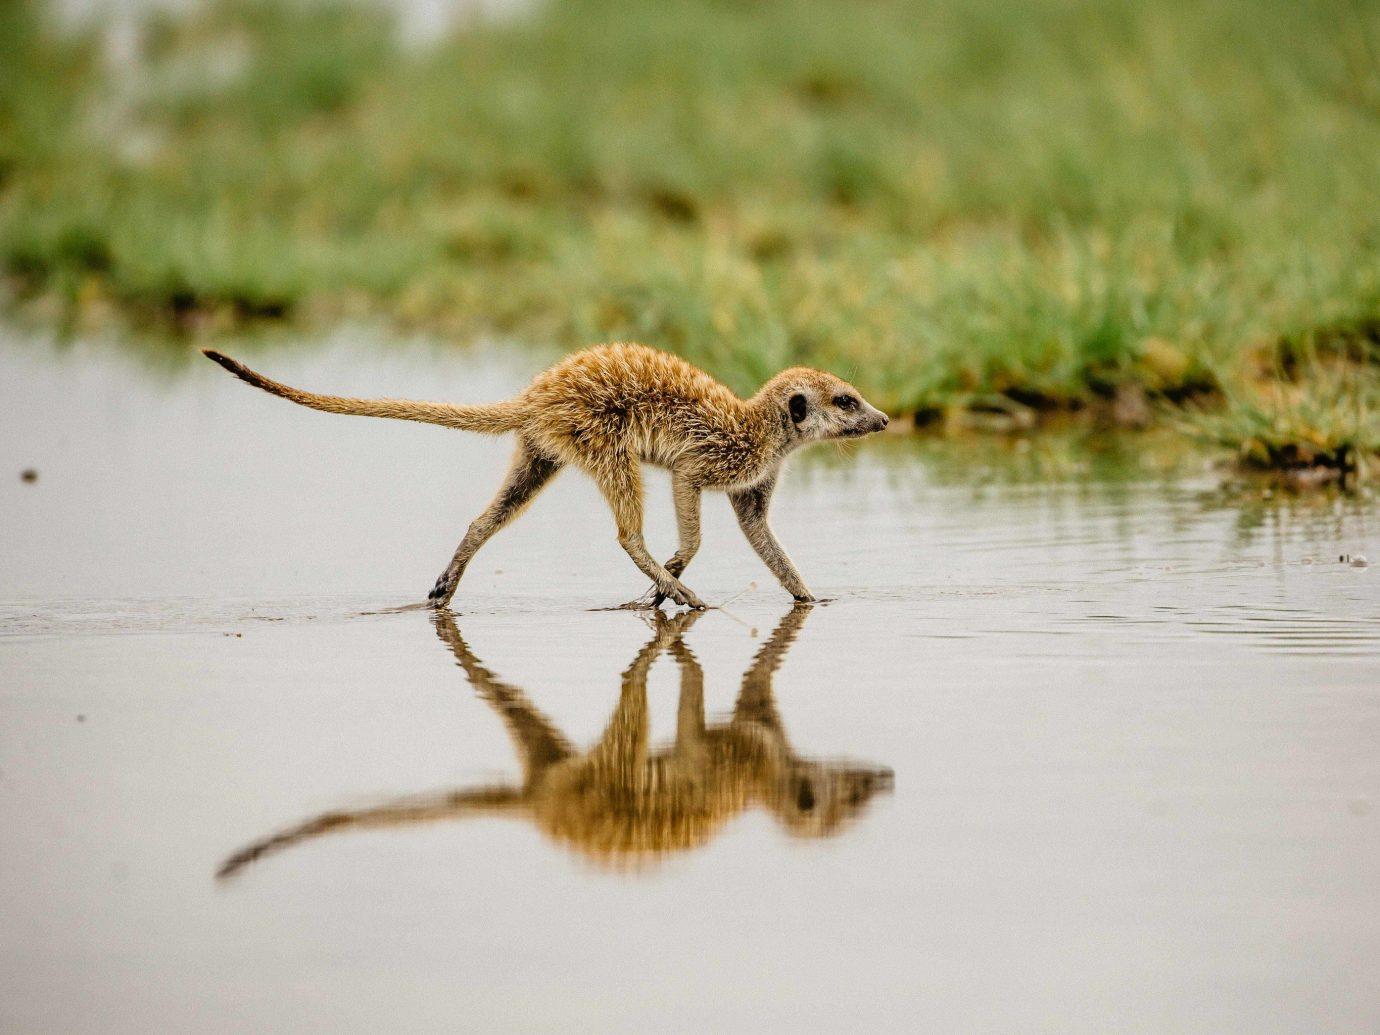 Outdoor Activities Safari Trip Ideas outdoor water Wildlife fauna animal terrestrial animal organism snout